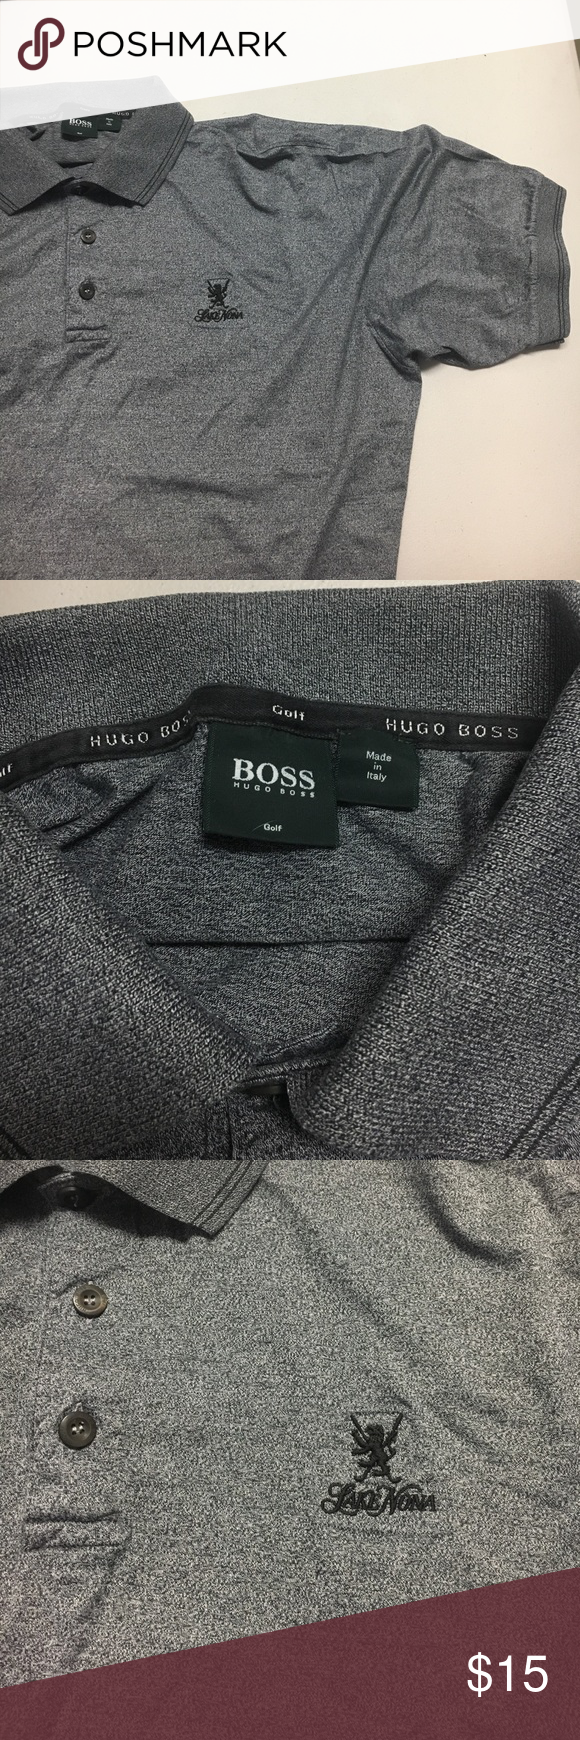 Sep 07, 2021· wallpaper polos aesthetic. Hugo boss gold three button polo   Hugo boss, Hugo, Shirts